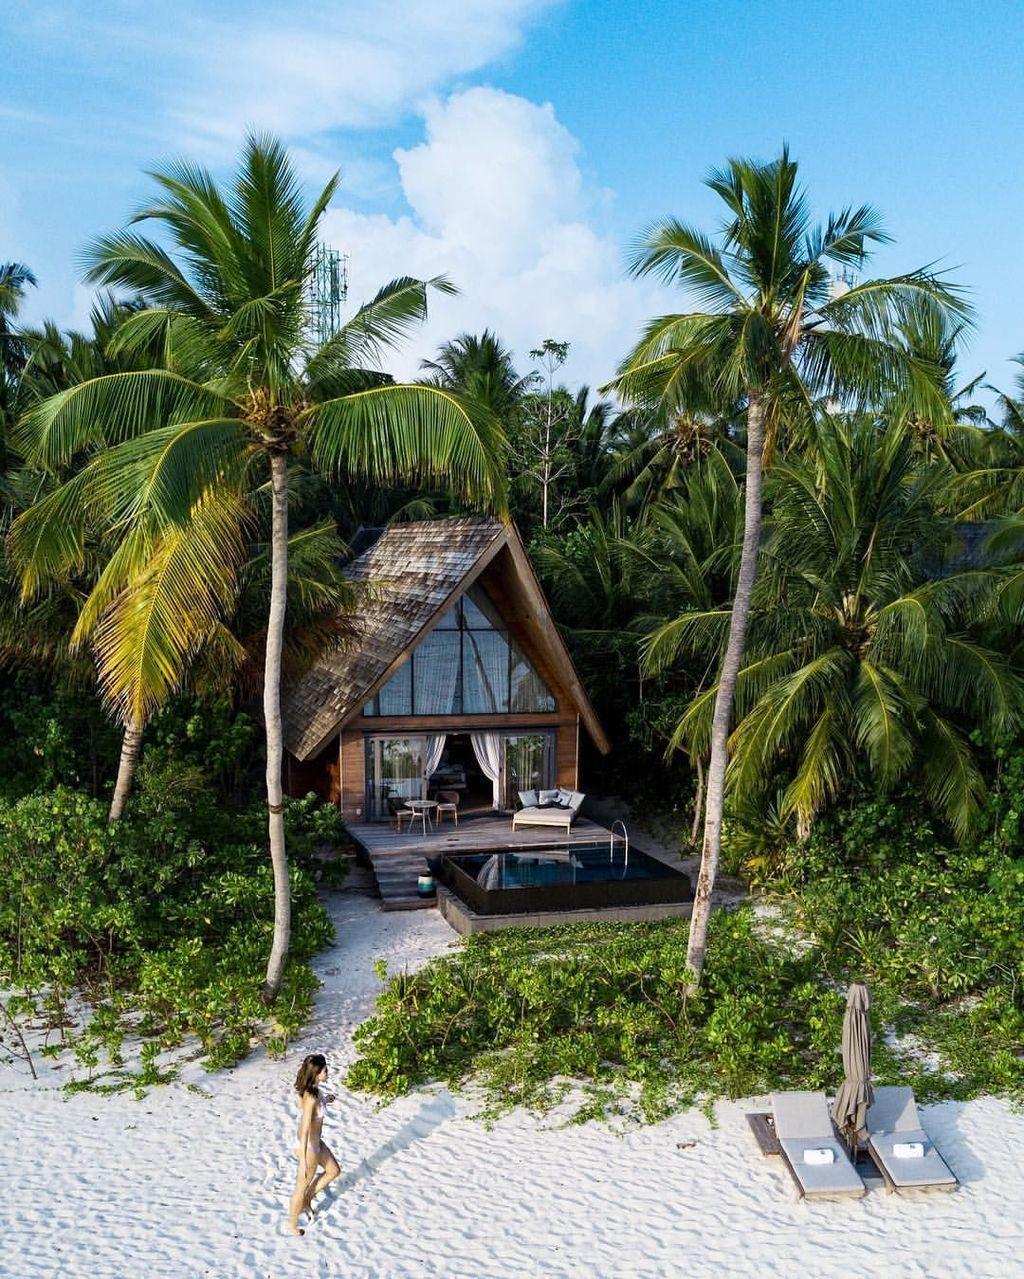 40 Awesome Tropical Beach House Design Ideas Tropical Beach Houses Beach House Design Dream Beach Houses